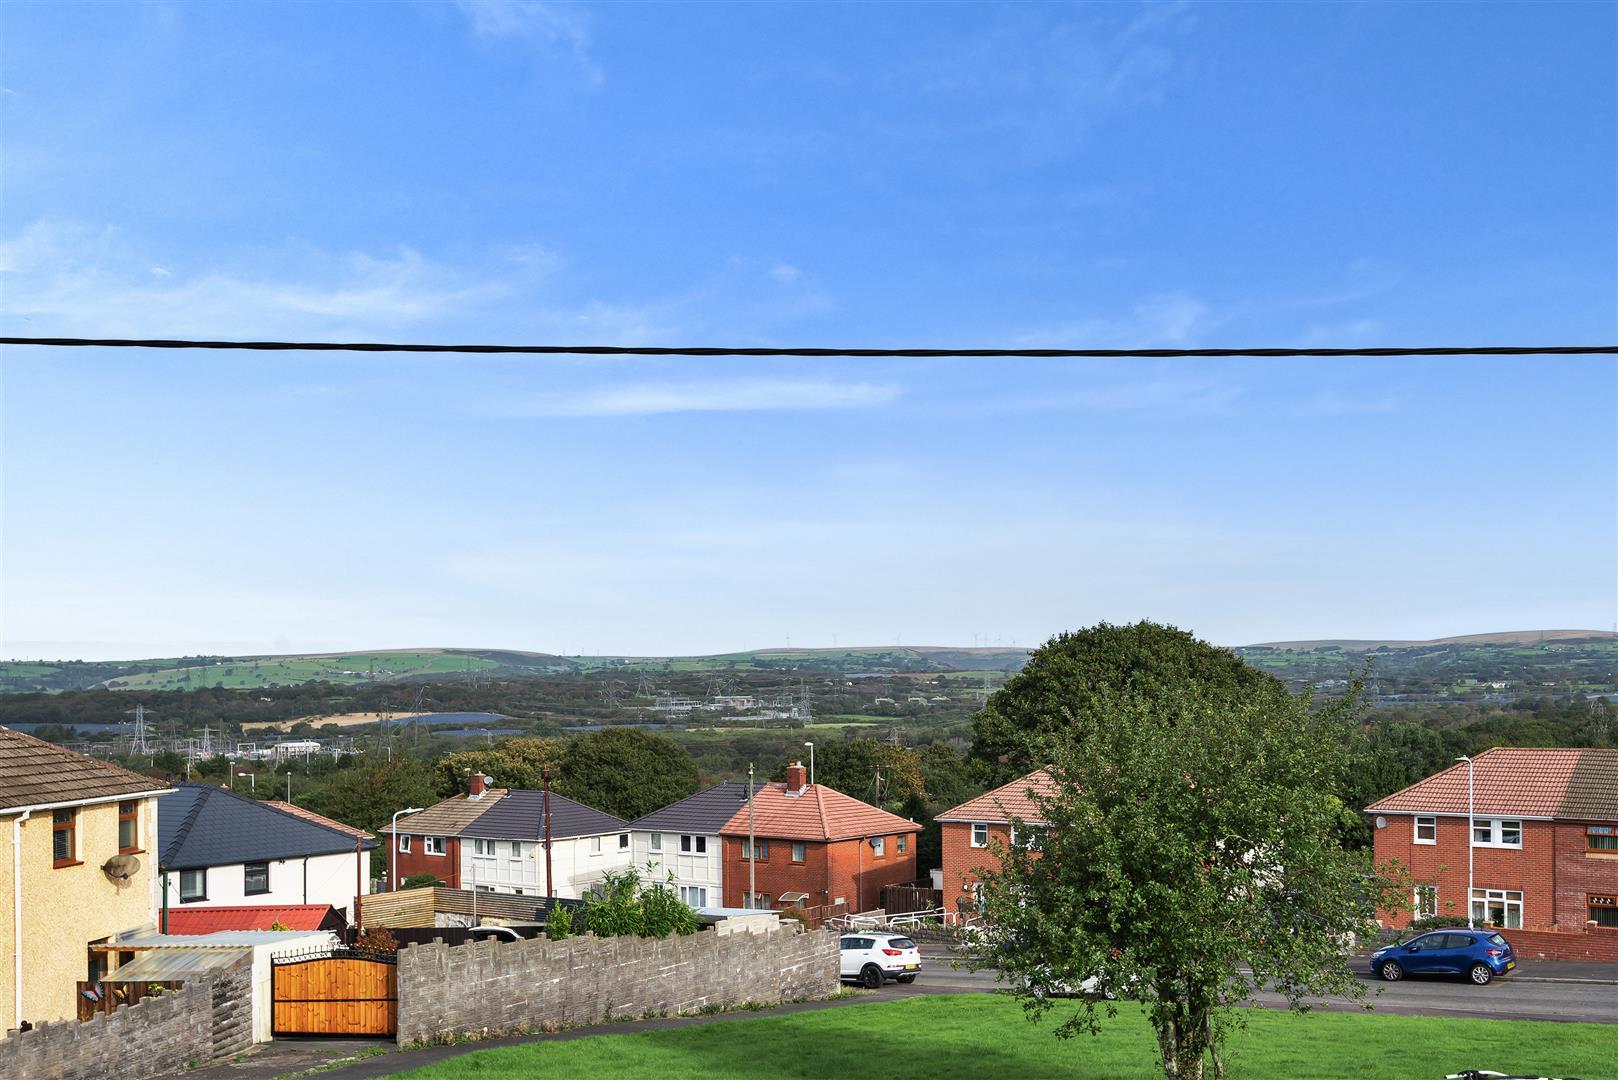 Pengors Road, Llangyfelach, Swansea, SA5 7JF